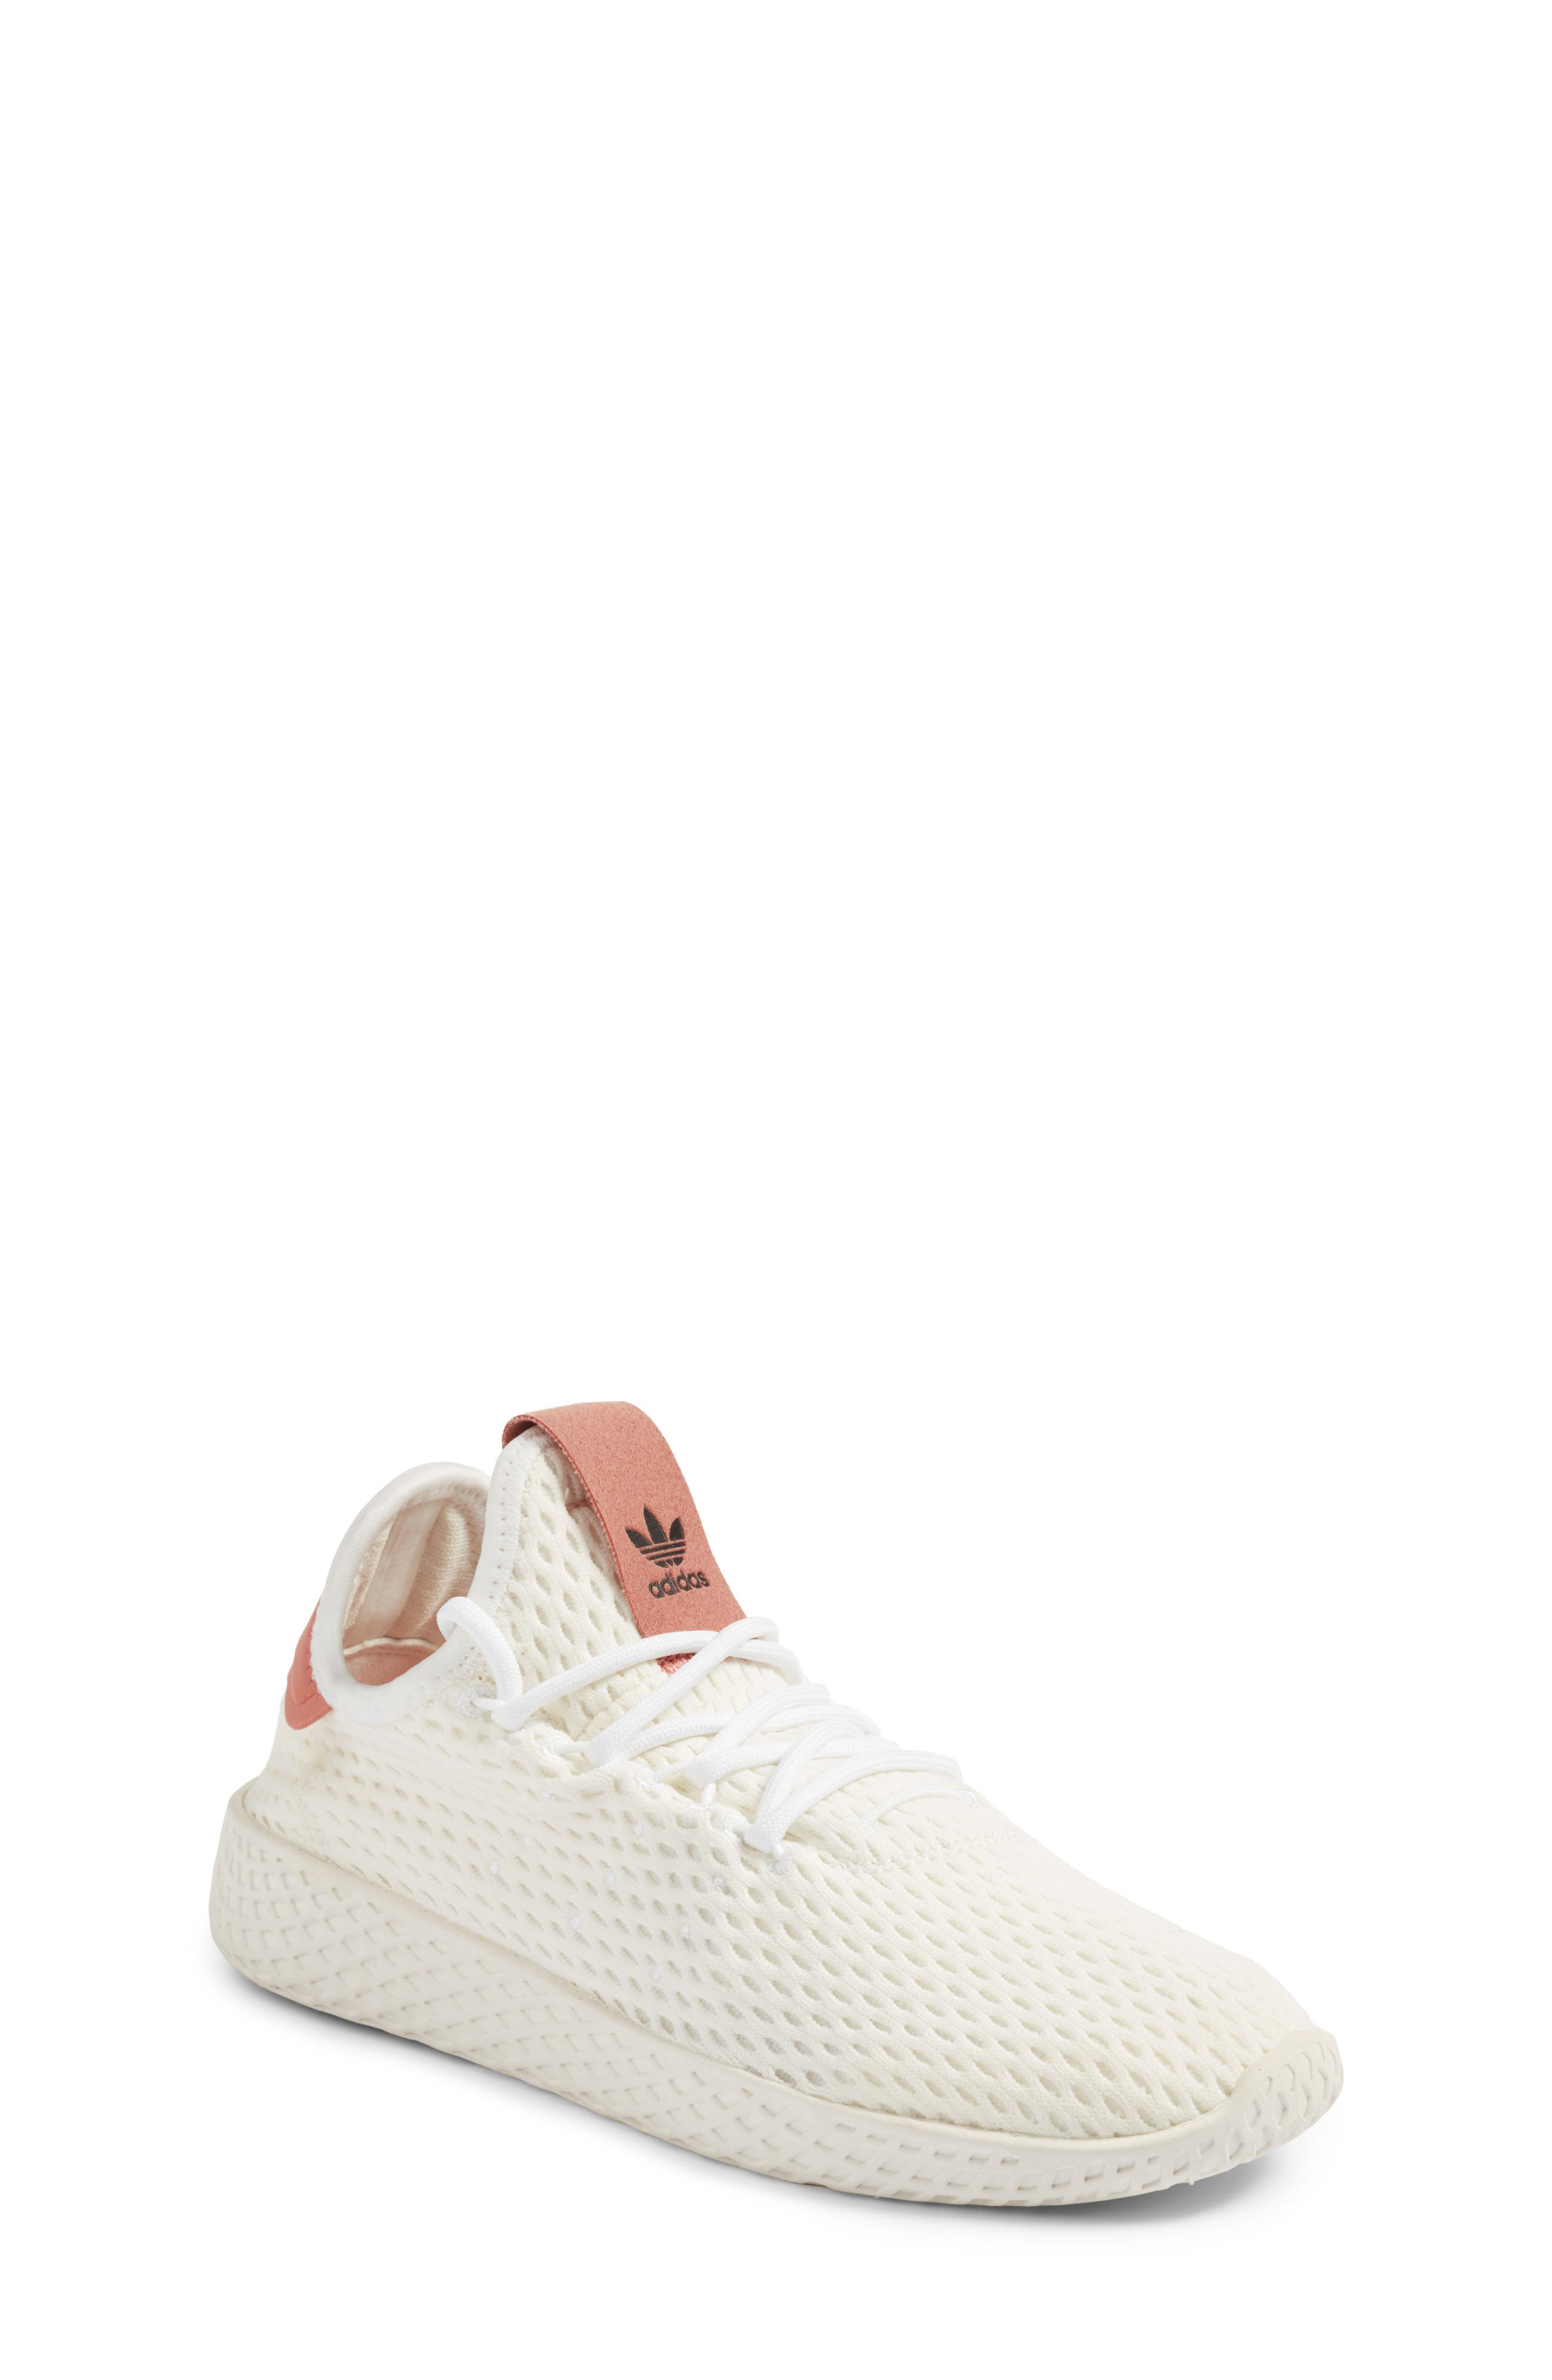 Originals x Pharrell Williams The Summers Mesh Sneaker,                         Main,                         color, 100